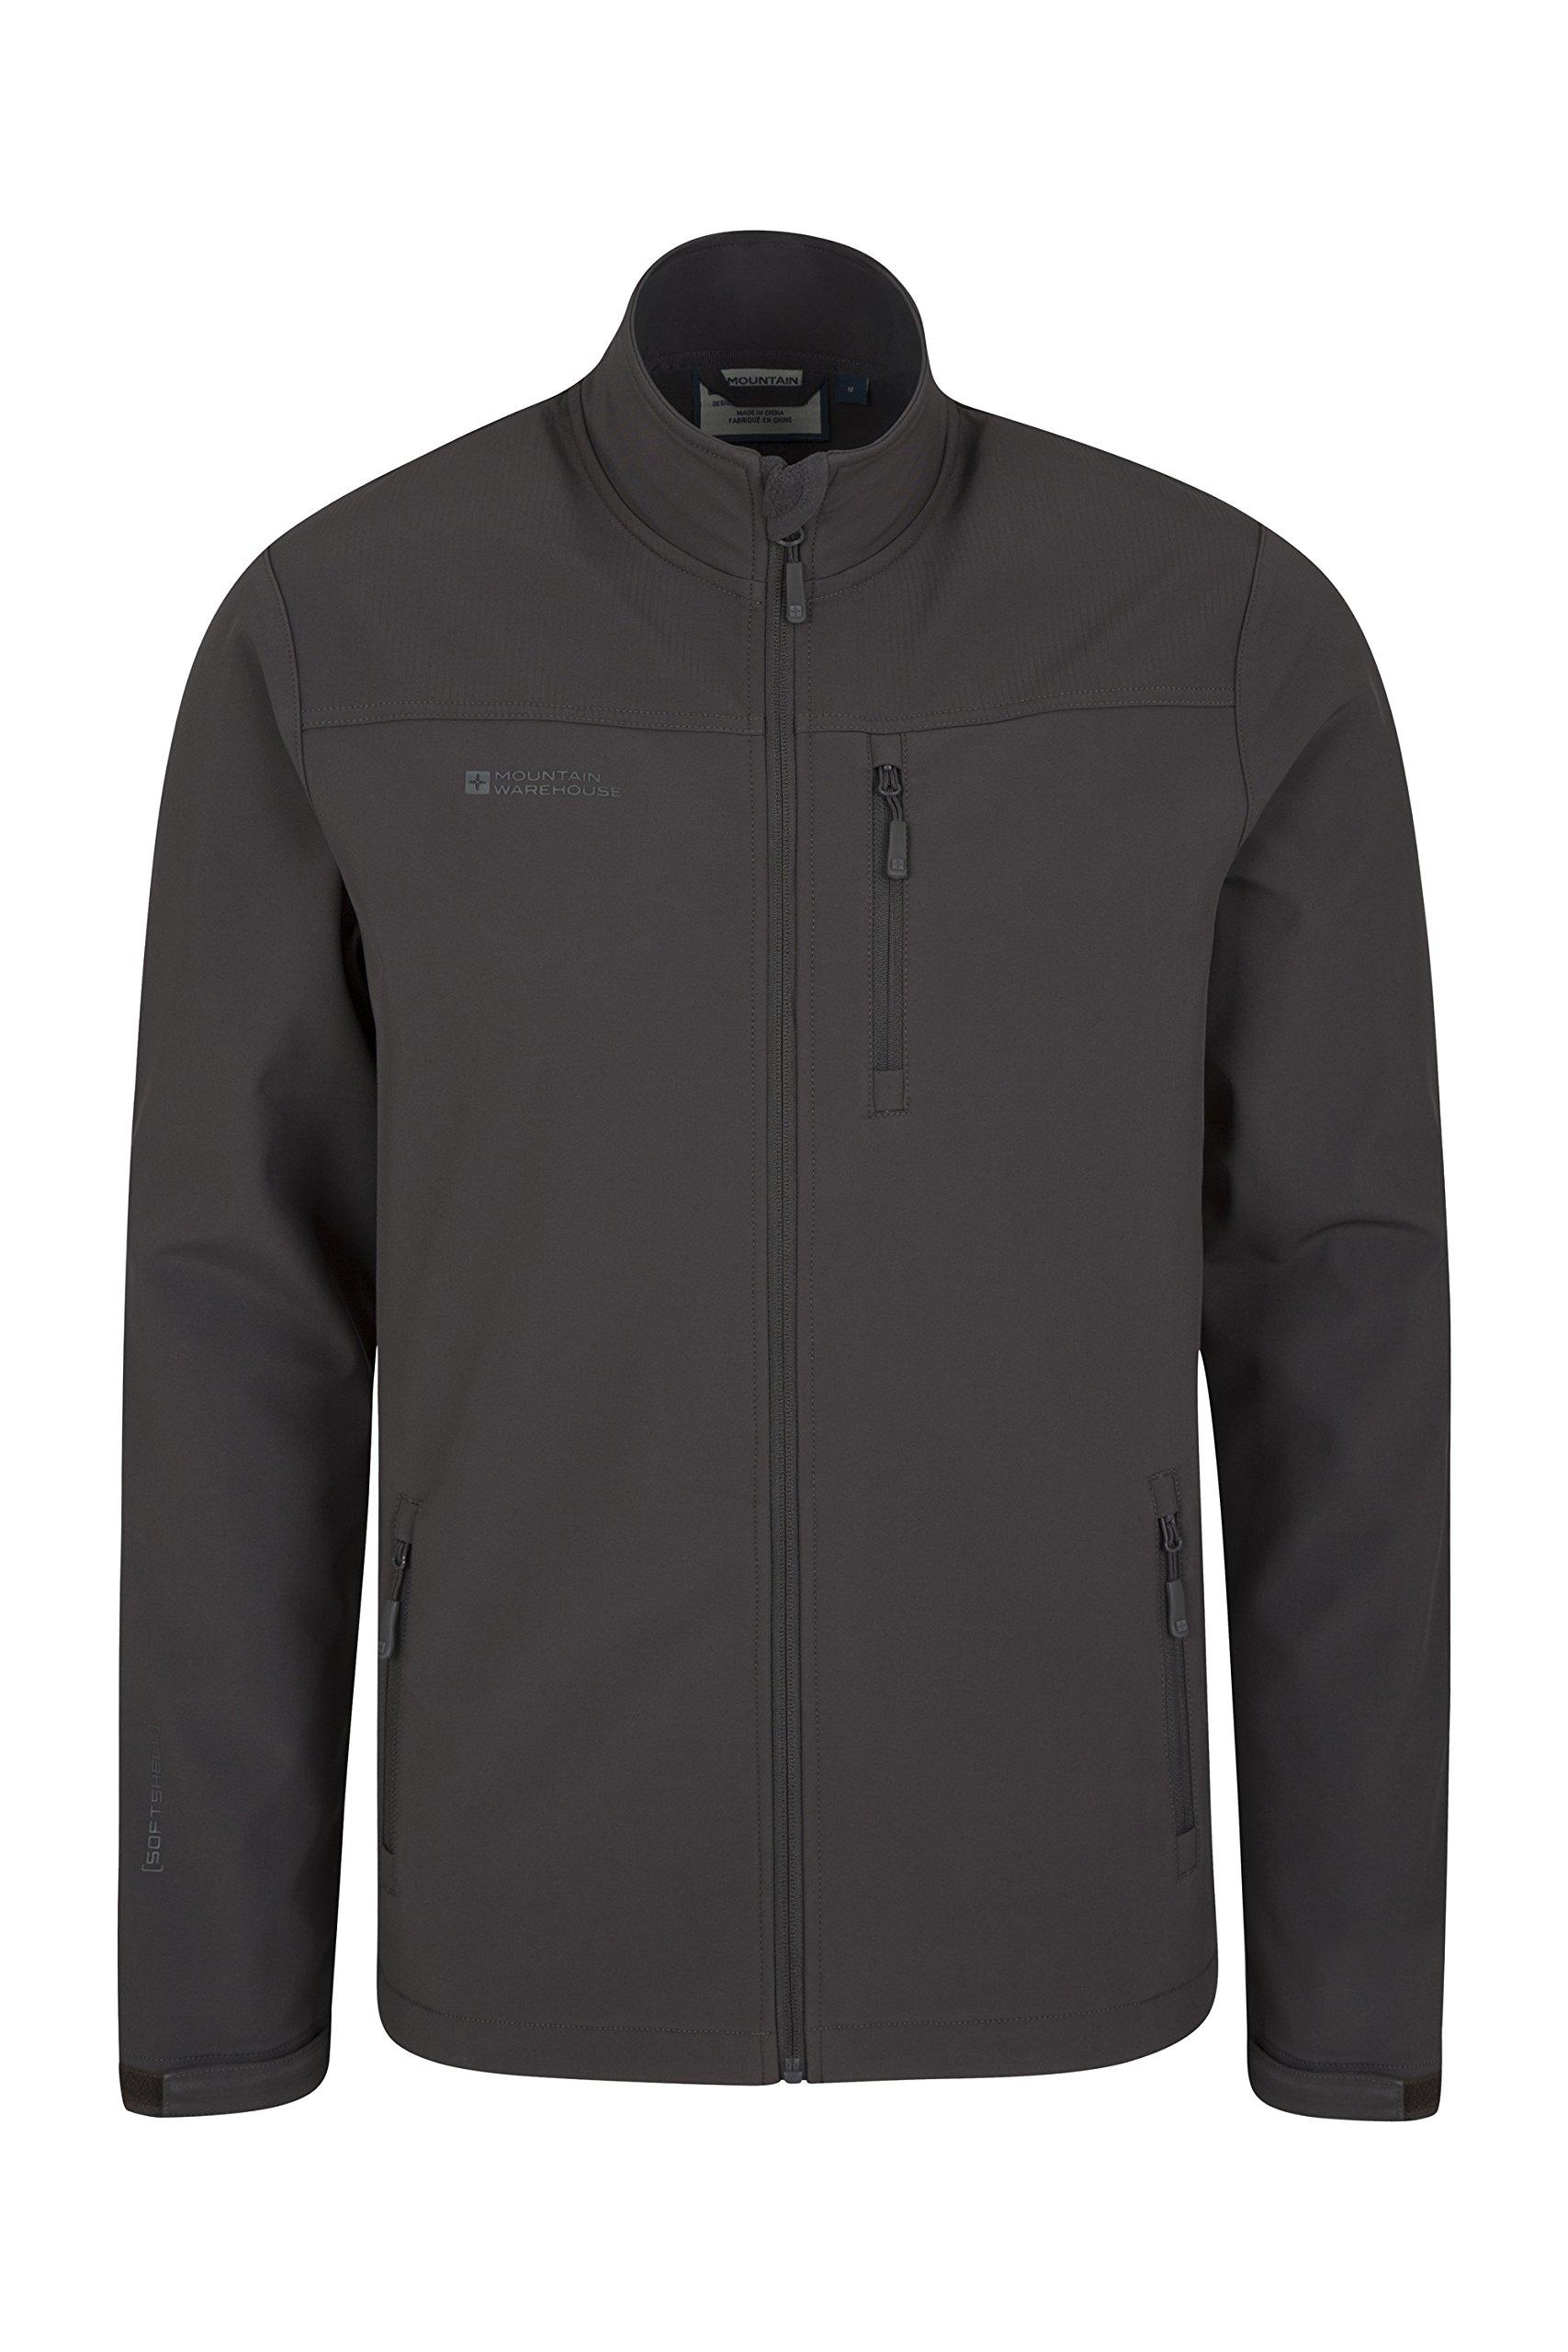 Mountain Warehouse Grasmere Mens Softshell Jacket -Breathable Raincoat Dark Grey XXX-Large